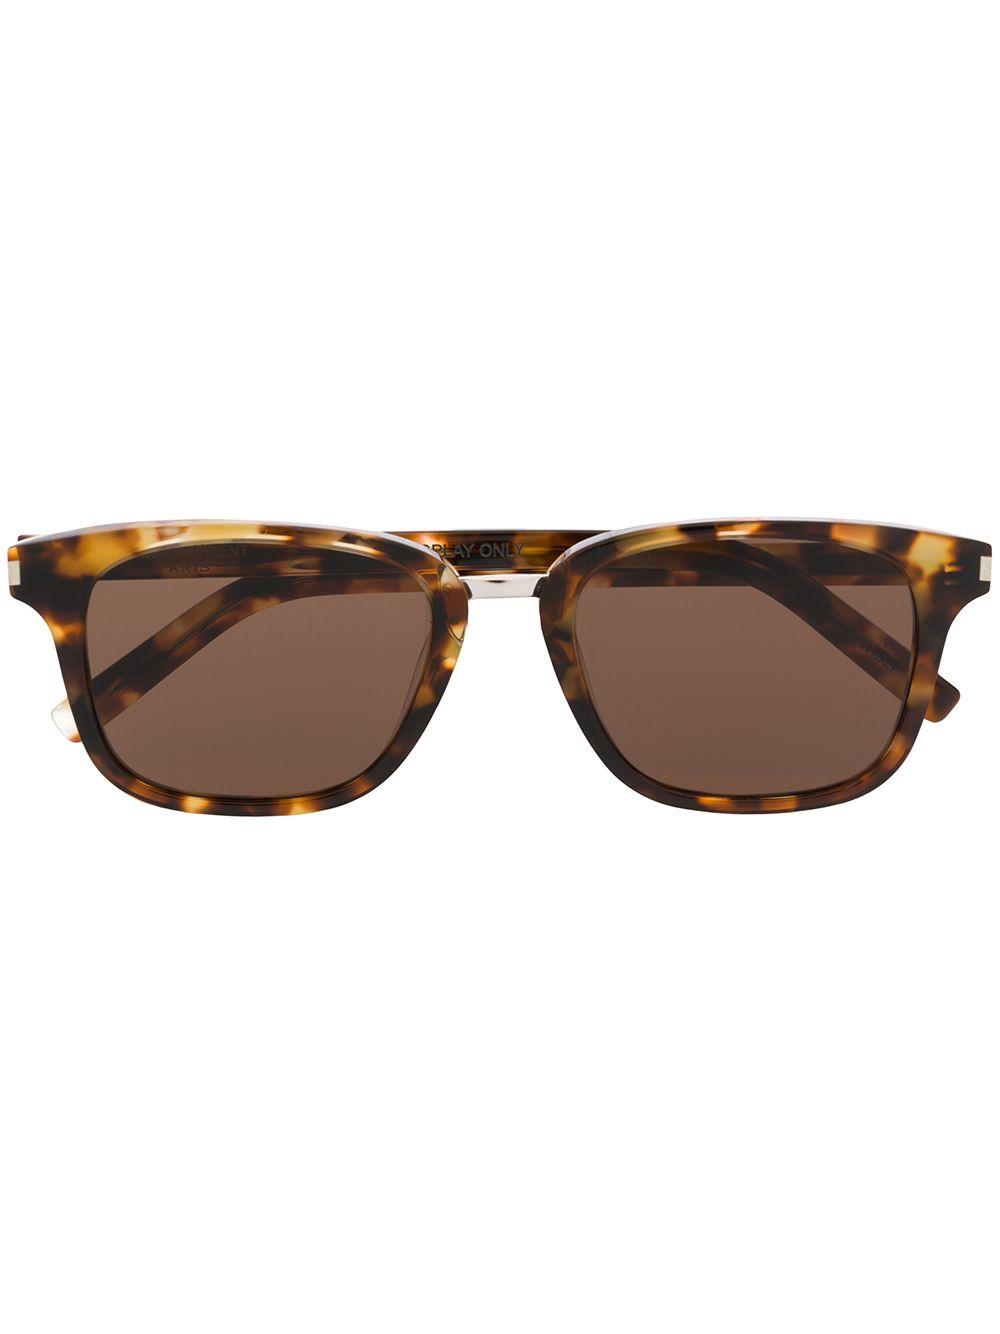 New Wave Sunglasses